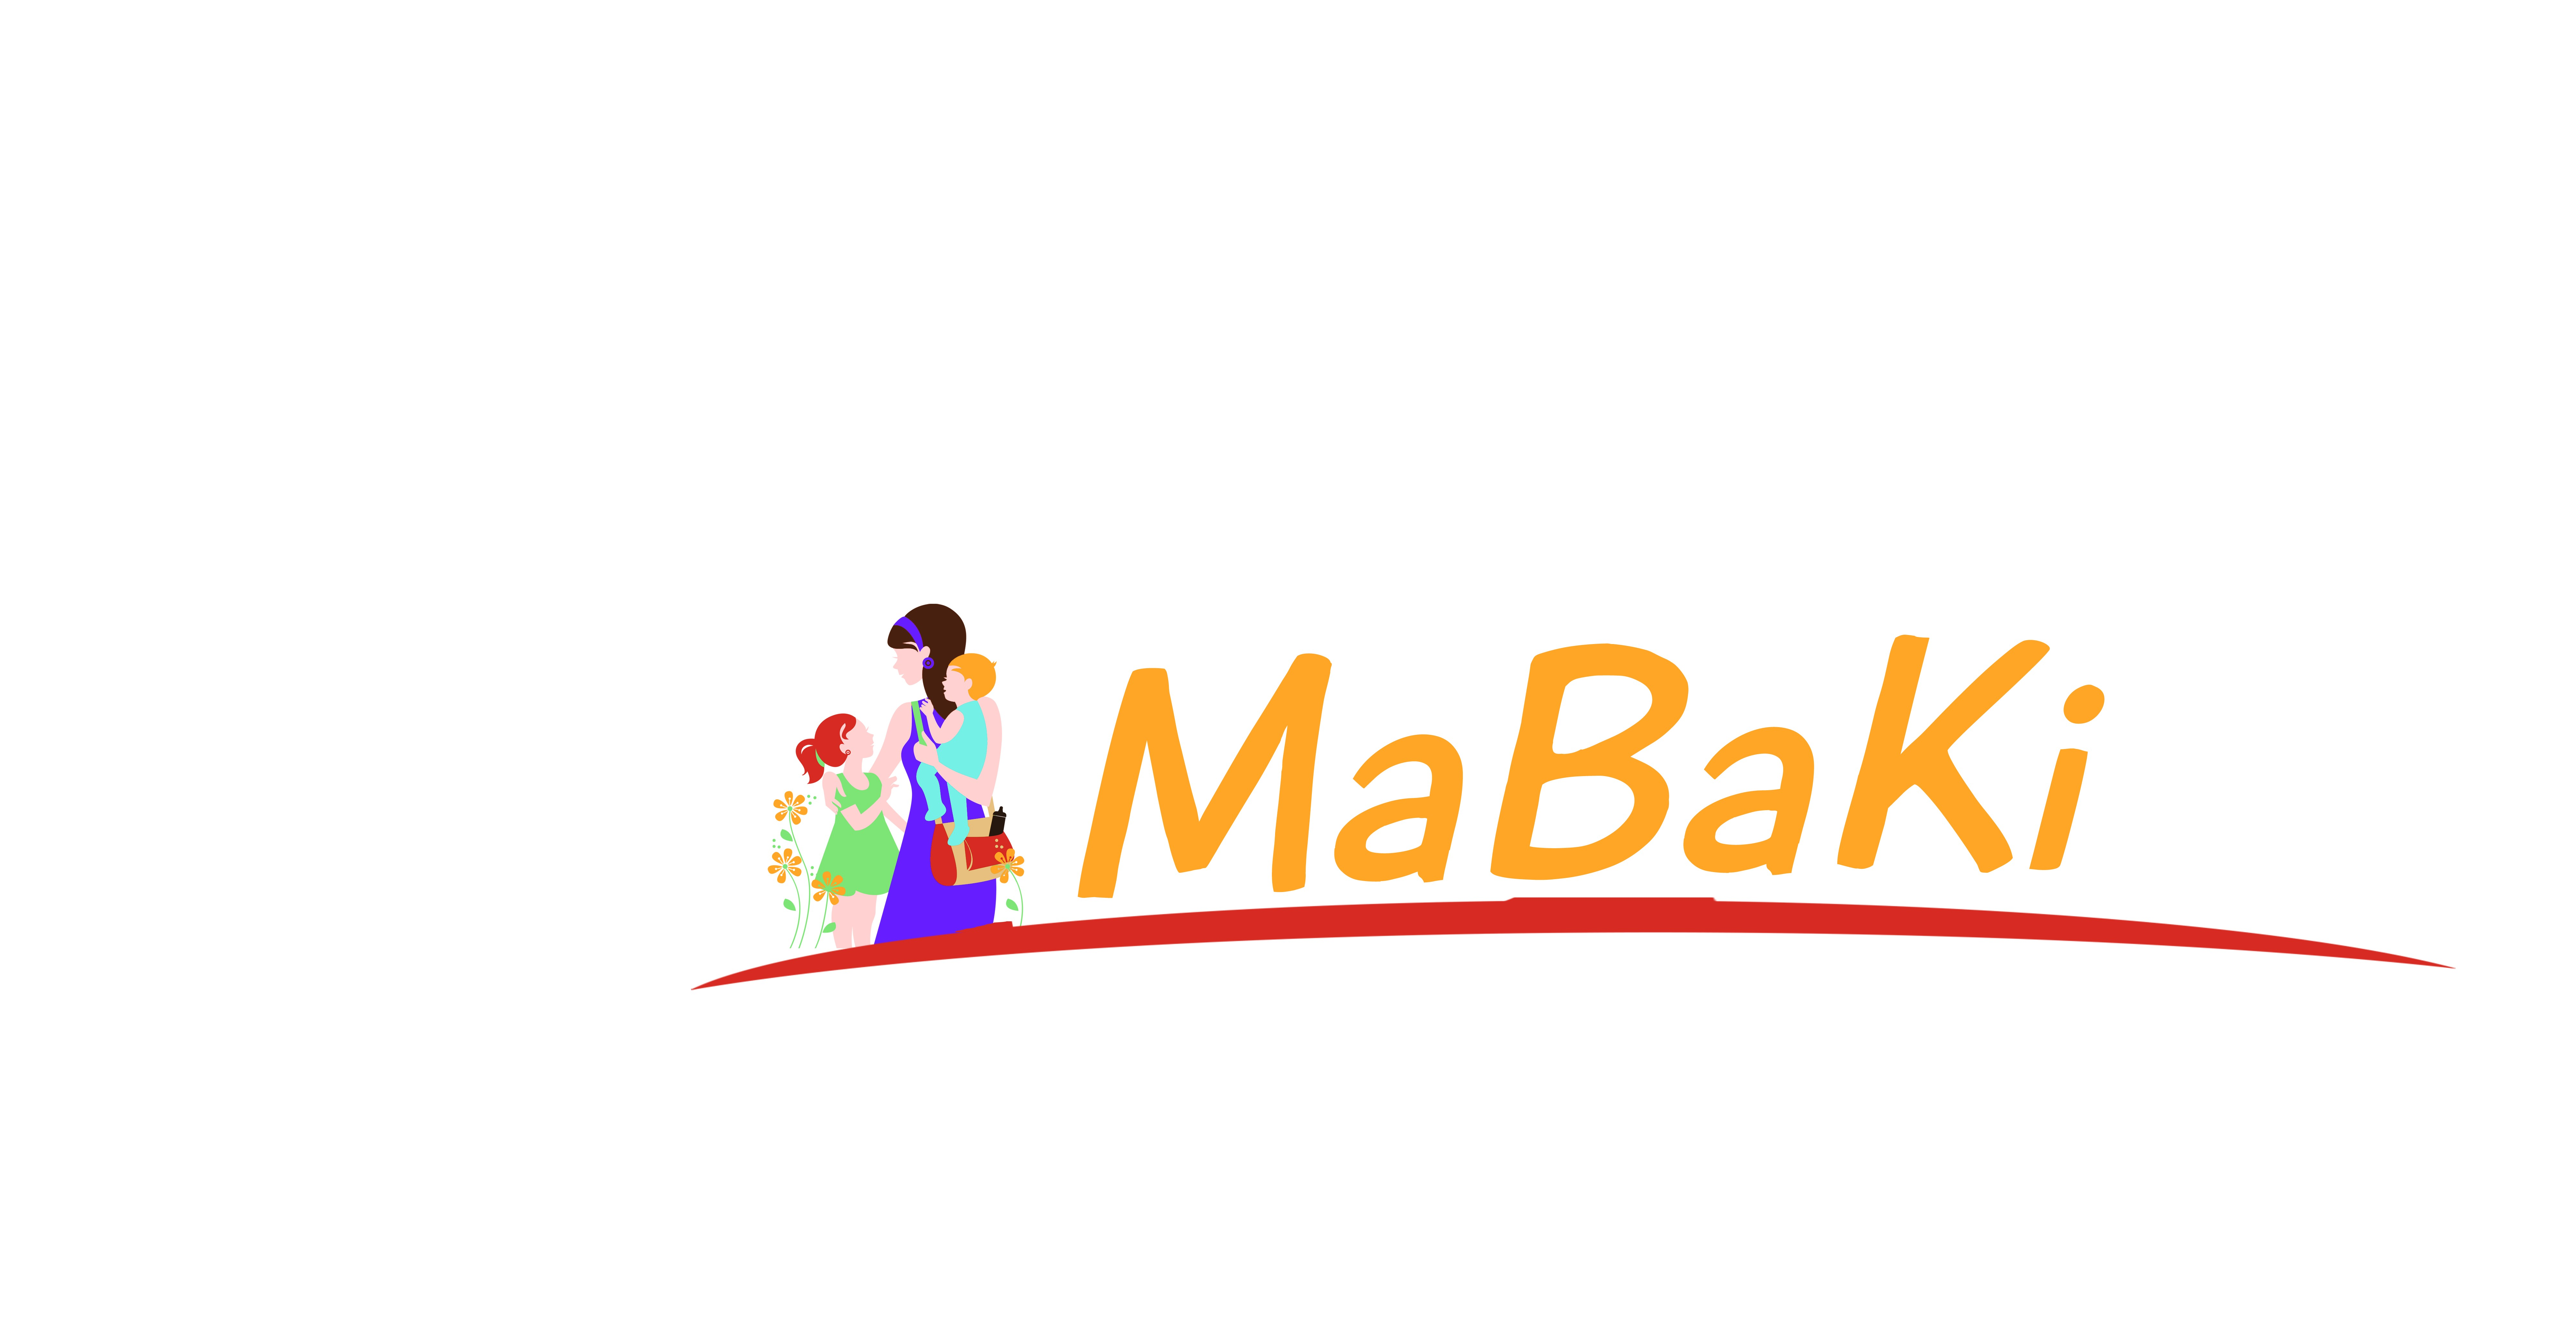 1 jahr mabaki mein erstes jahr als bloggerin kinderchaos familienblog. Black Bedroom Furniture Sets. Home Design Ideas